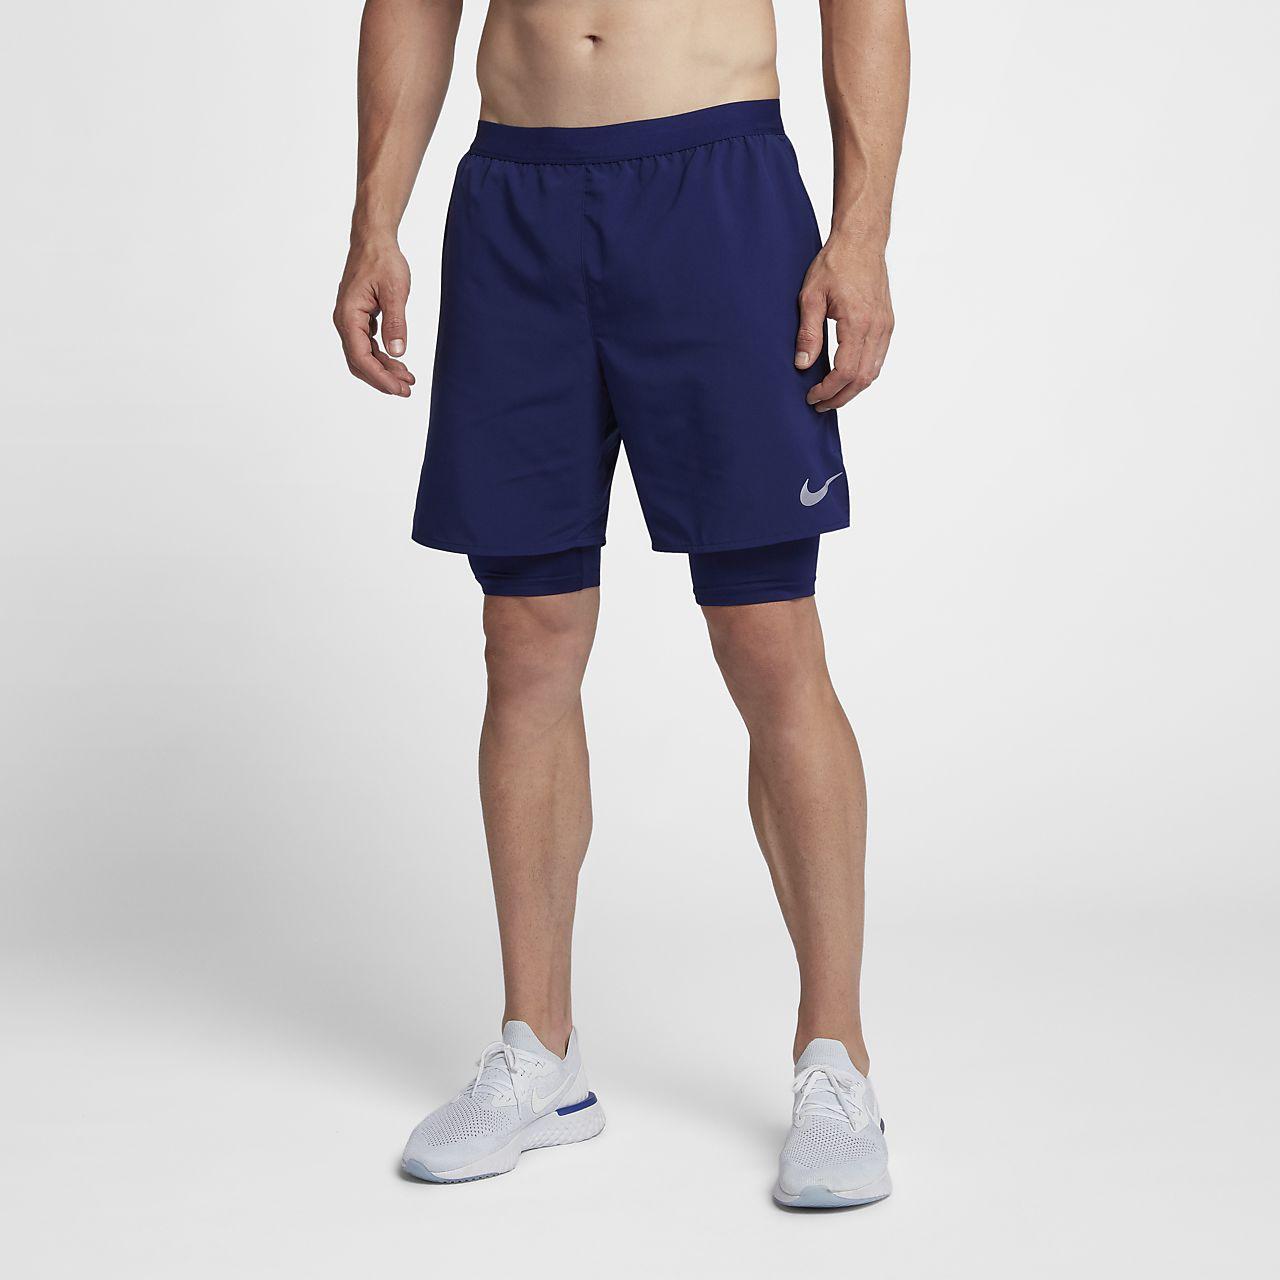 de92d4c9c6a2 Nike Flex Stride Men s 2-in-1 Running Shorts. Nike.com GB